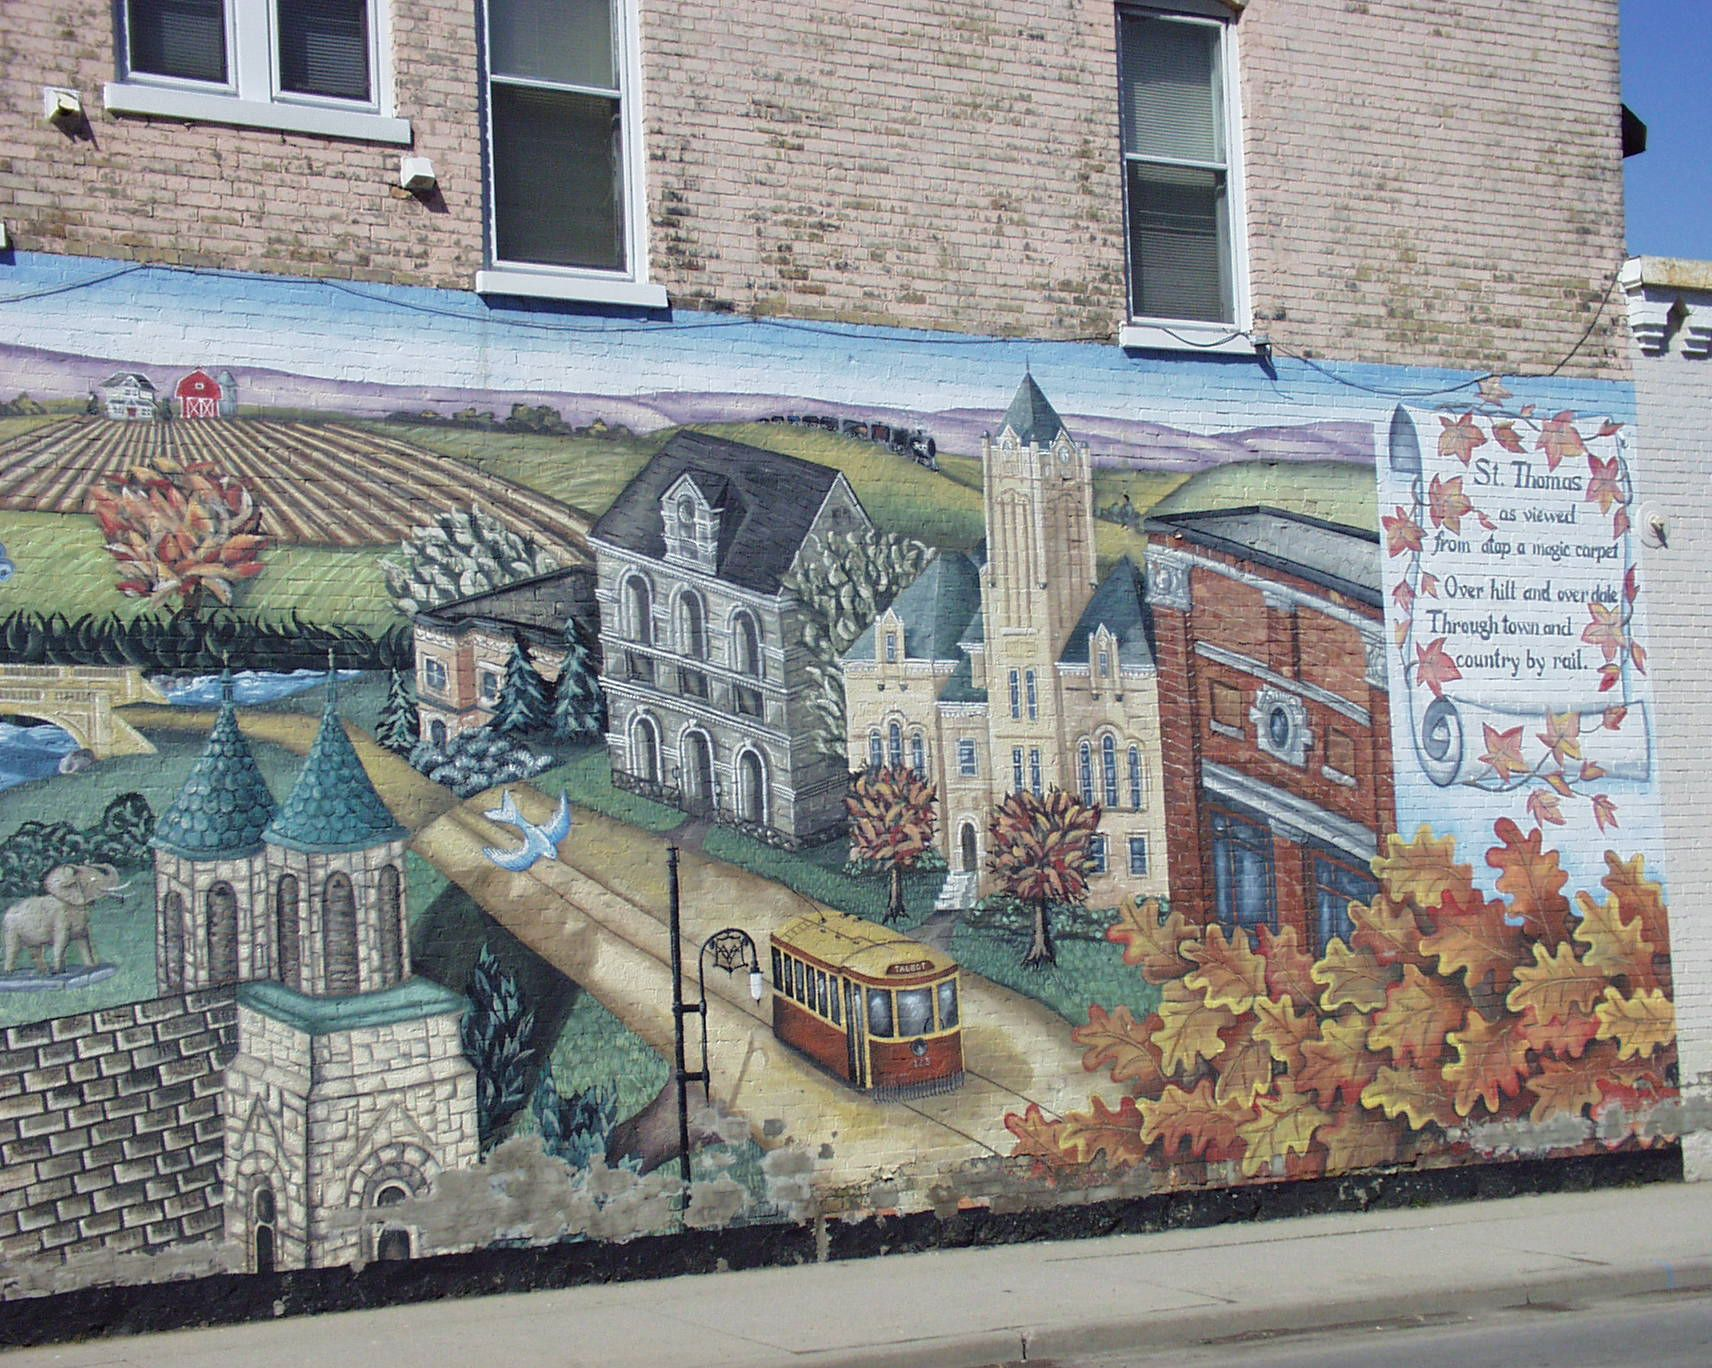 wall mural in st thomas ontario murals graffiti wall art and wall mural in st thomas ontario